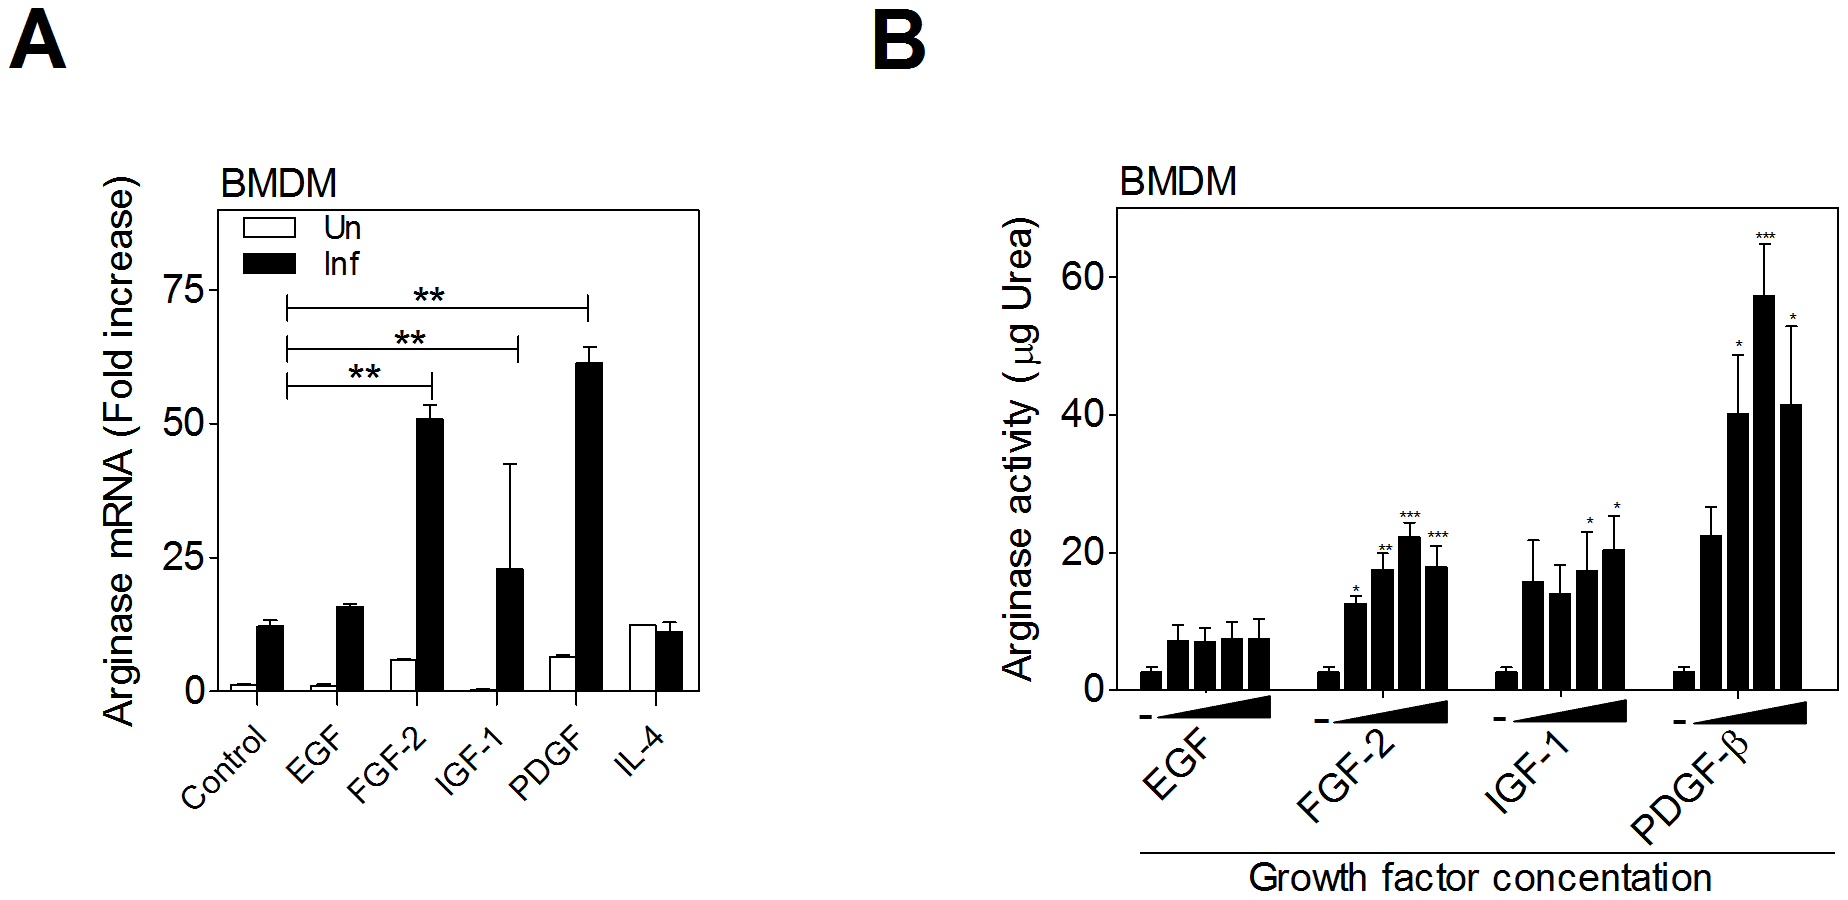 Growth factors upregulate arginase 1 in macrophages.